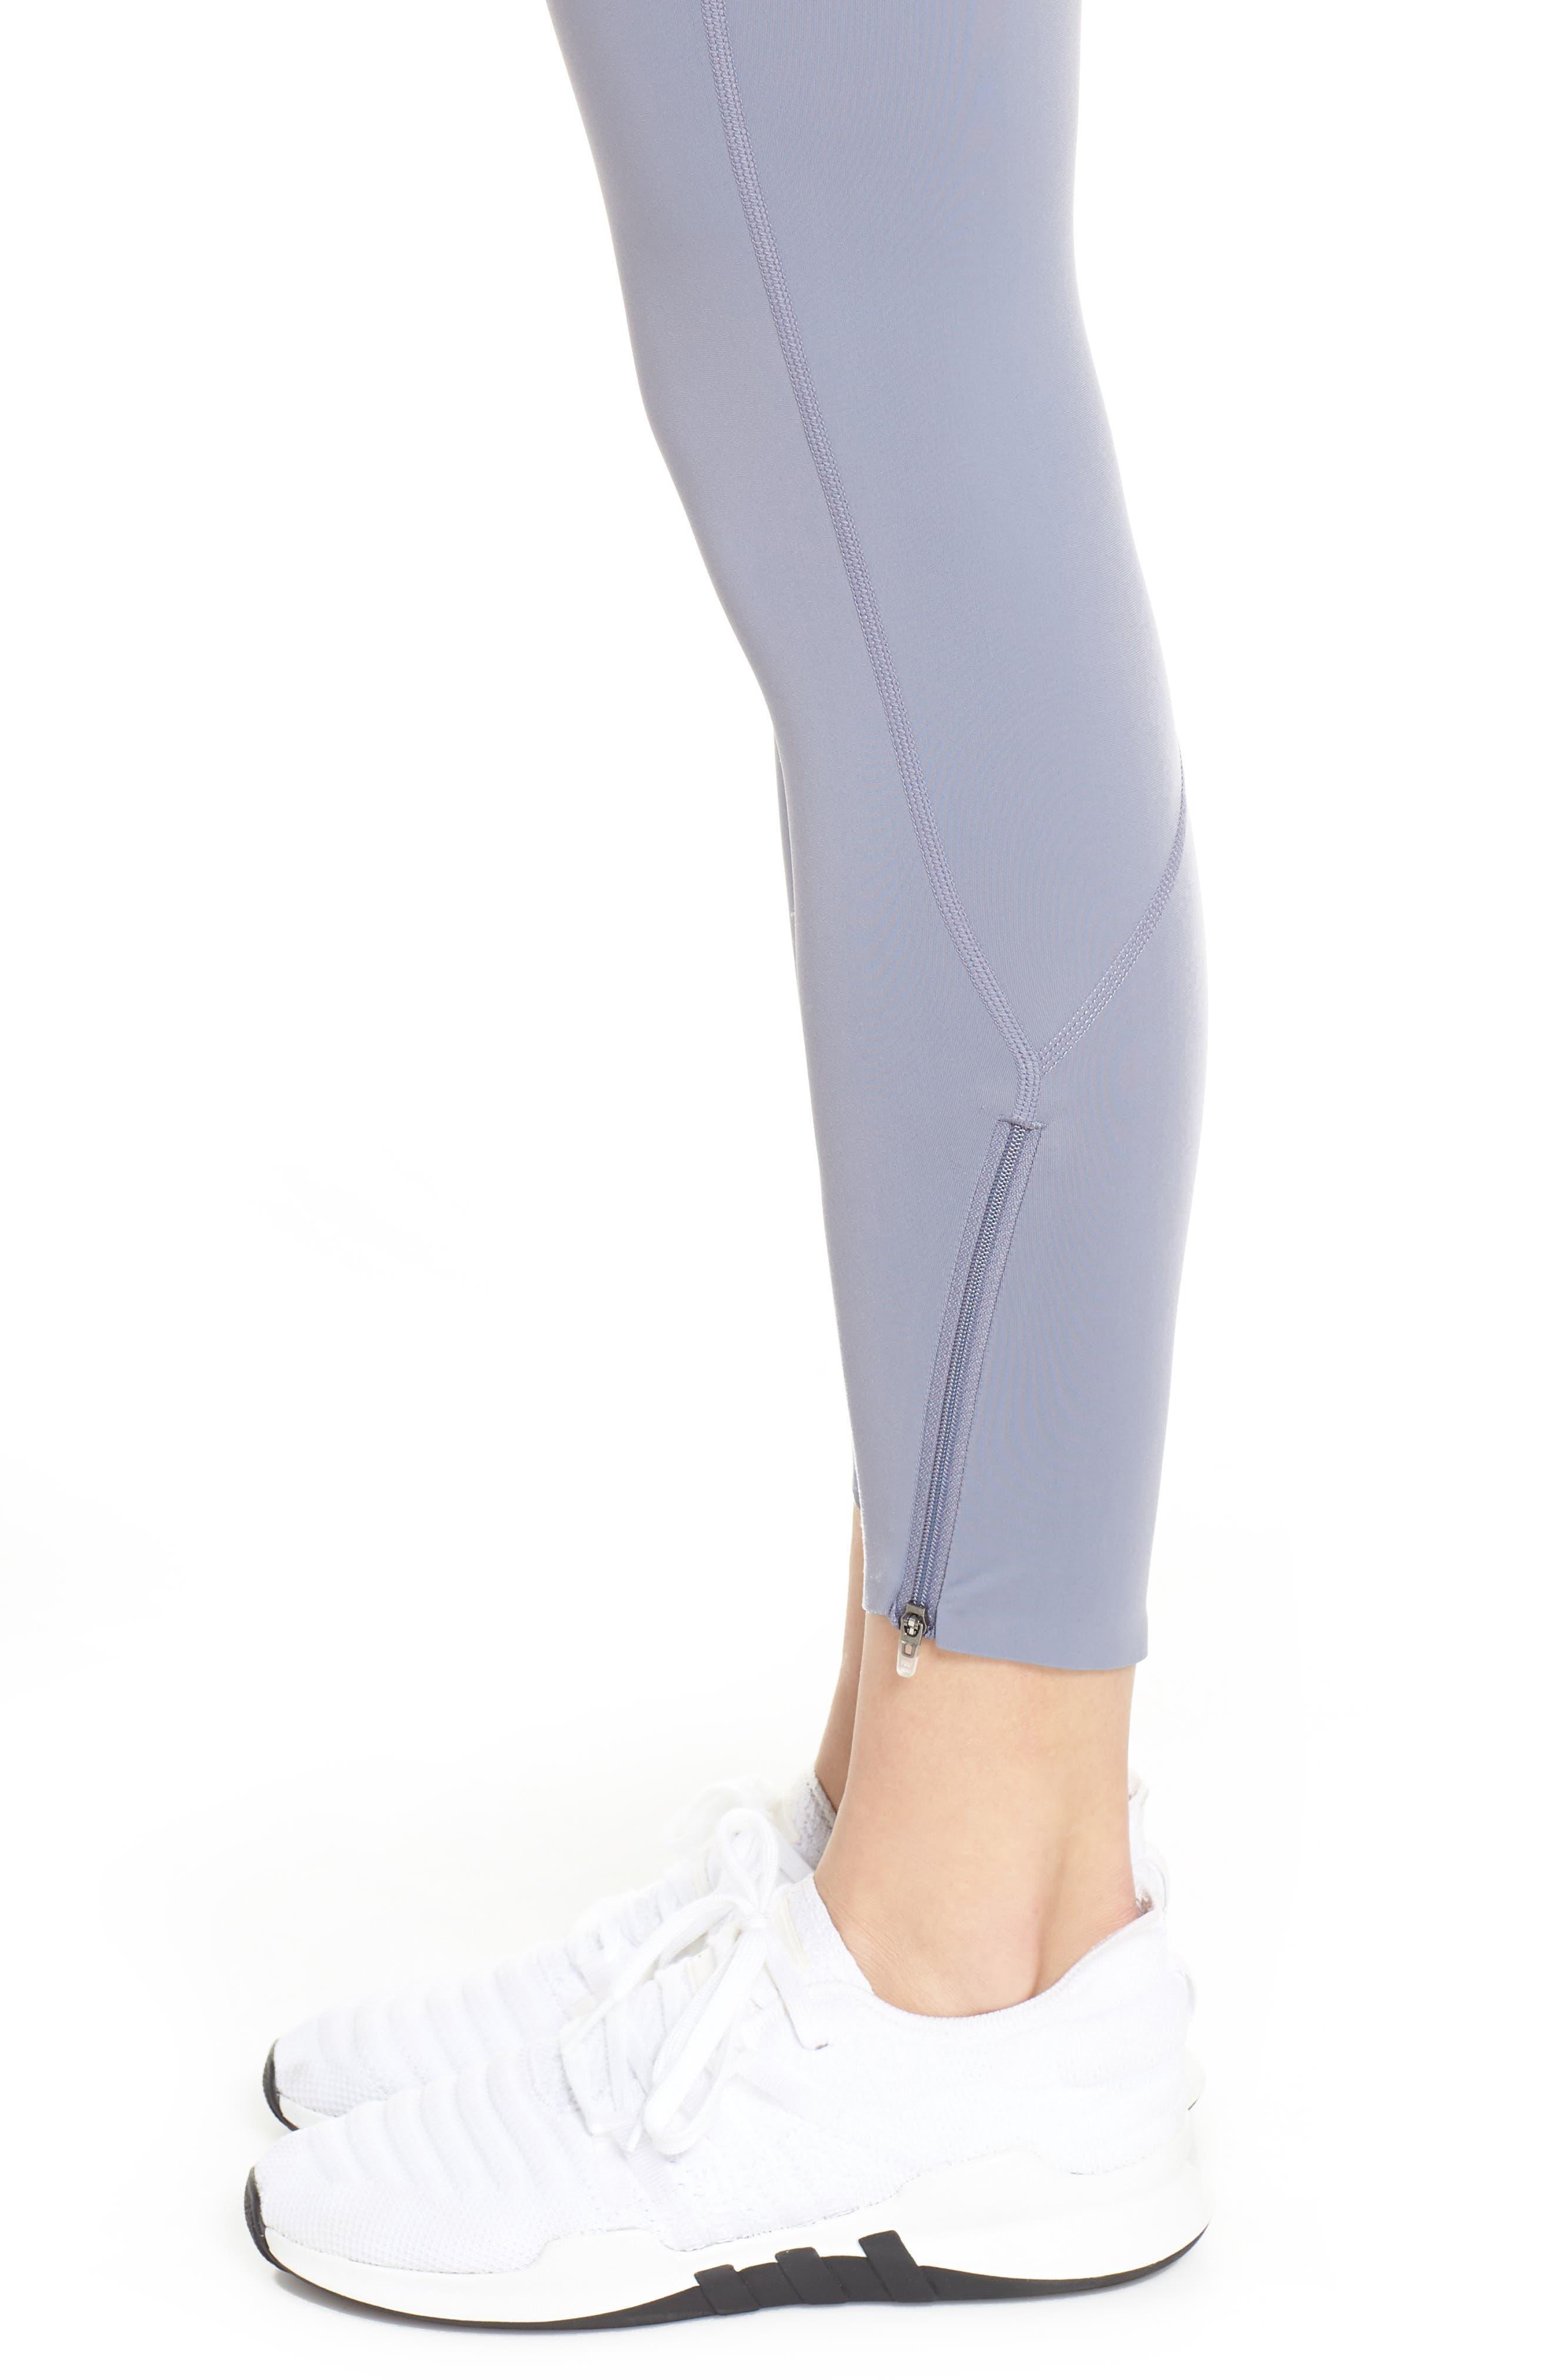 ZELLA, Luella Luxe High Waist 7/8 Leggings, Alternate thumbnail 5, color, GREY GRANITE